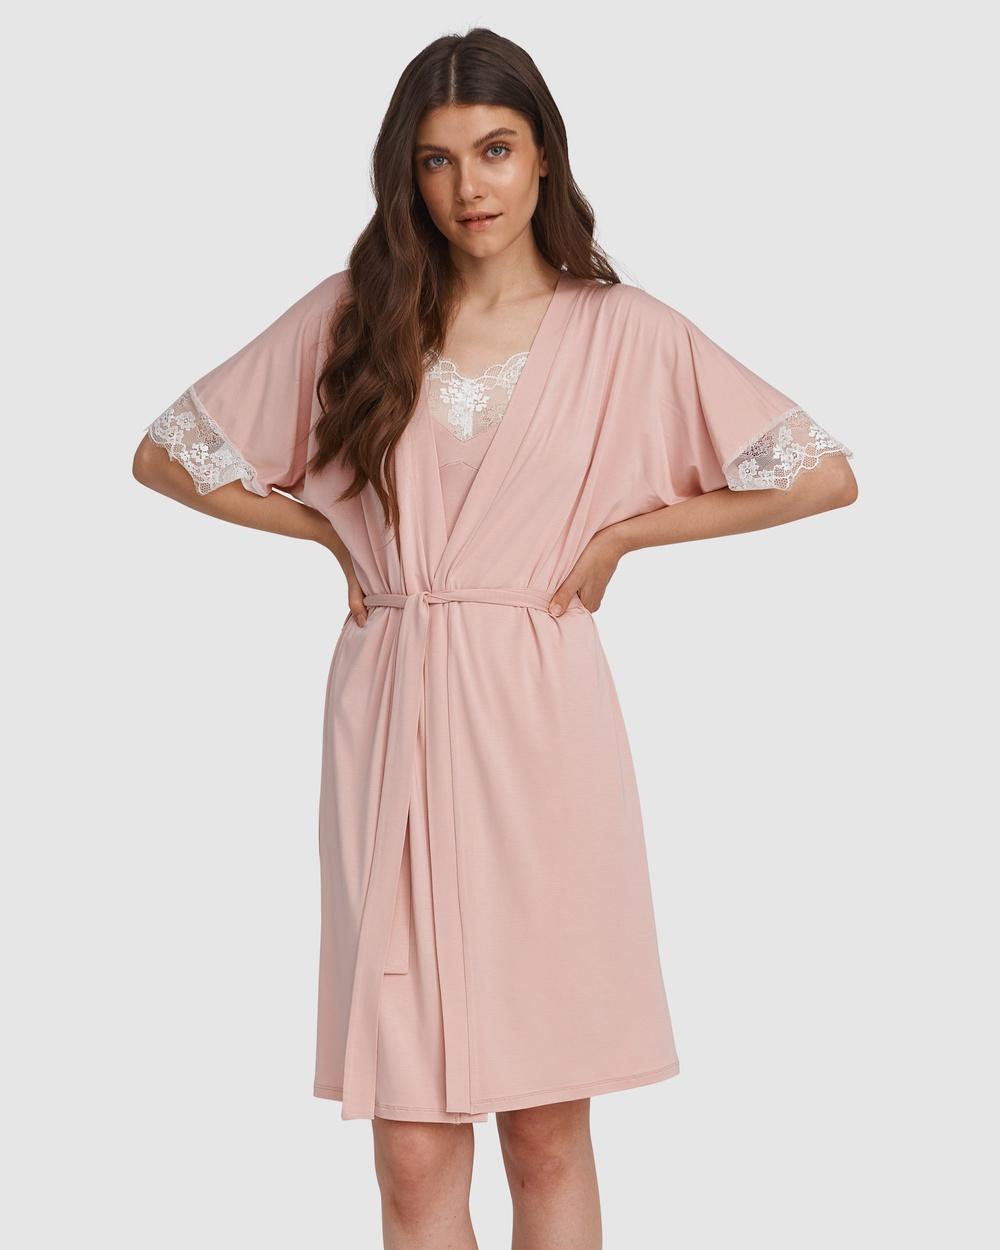 Oh!Zuza Lace Trim Robe Sleepwear Pink